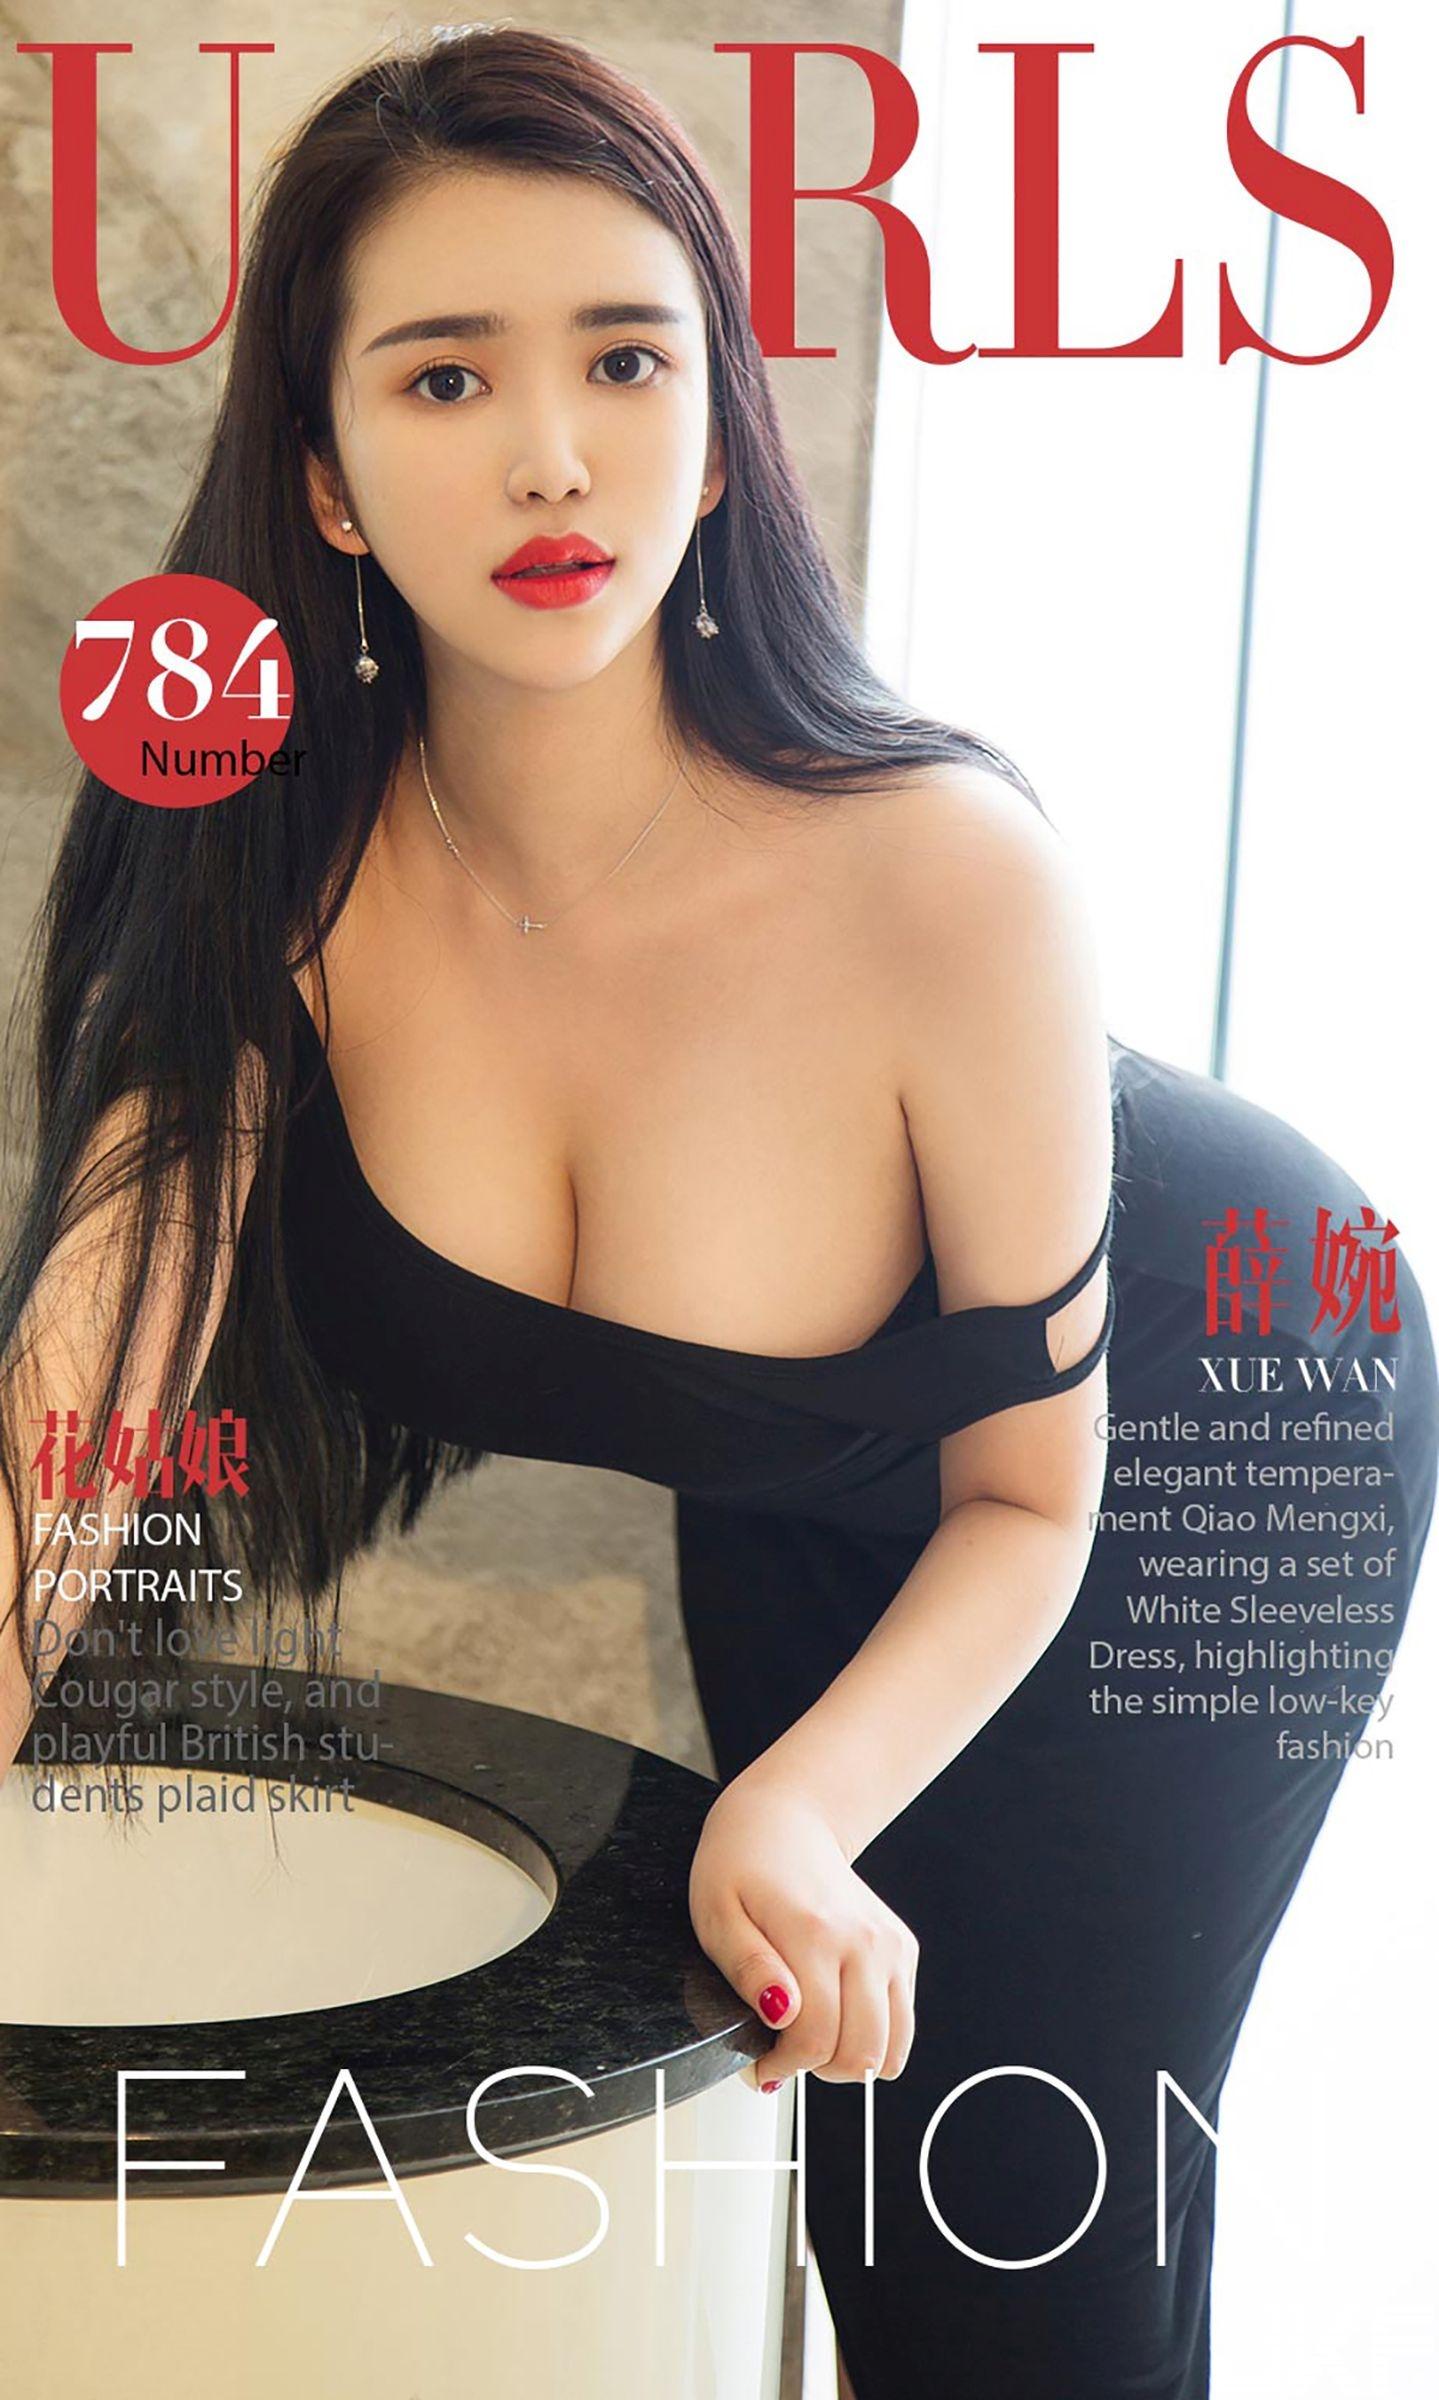 【Ugirls愛尤物系列】2017.07.12 No.784 花姑娘 薛婉【40P】 - 貼圖 - 絲襪美腿 -